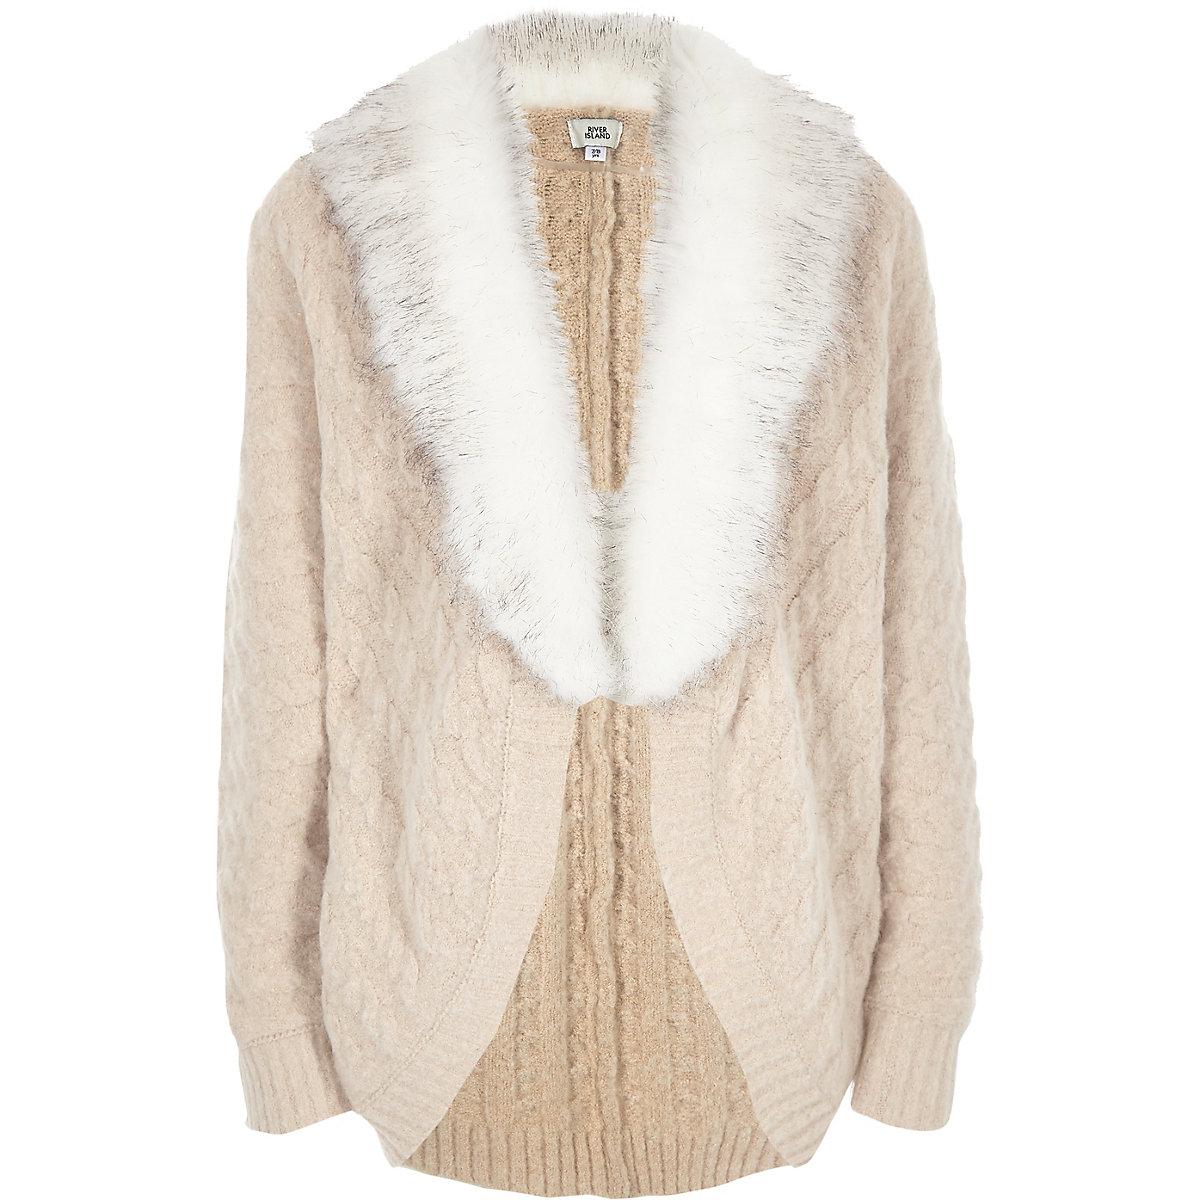 Girls light brown knit faux fur trim cardigan